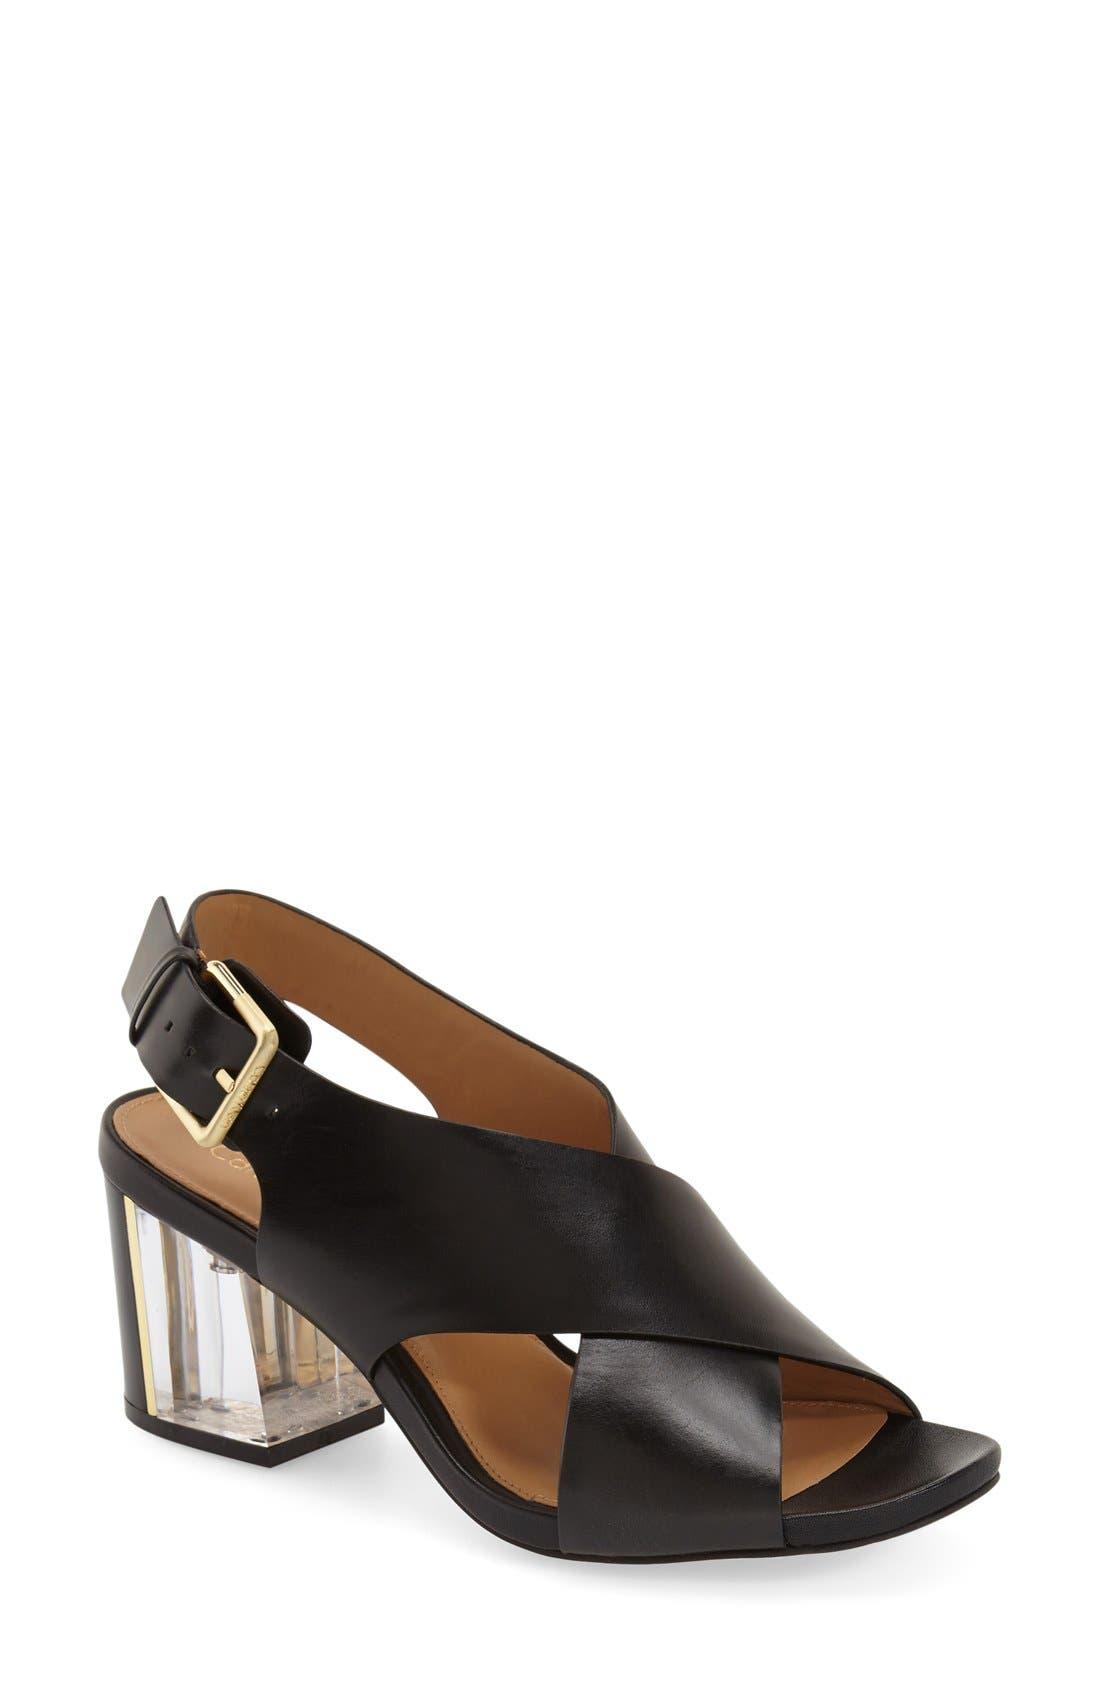 Main Image - Calvin Klein 'Loni' Clear Block Heel Sandal (Women)